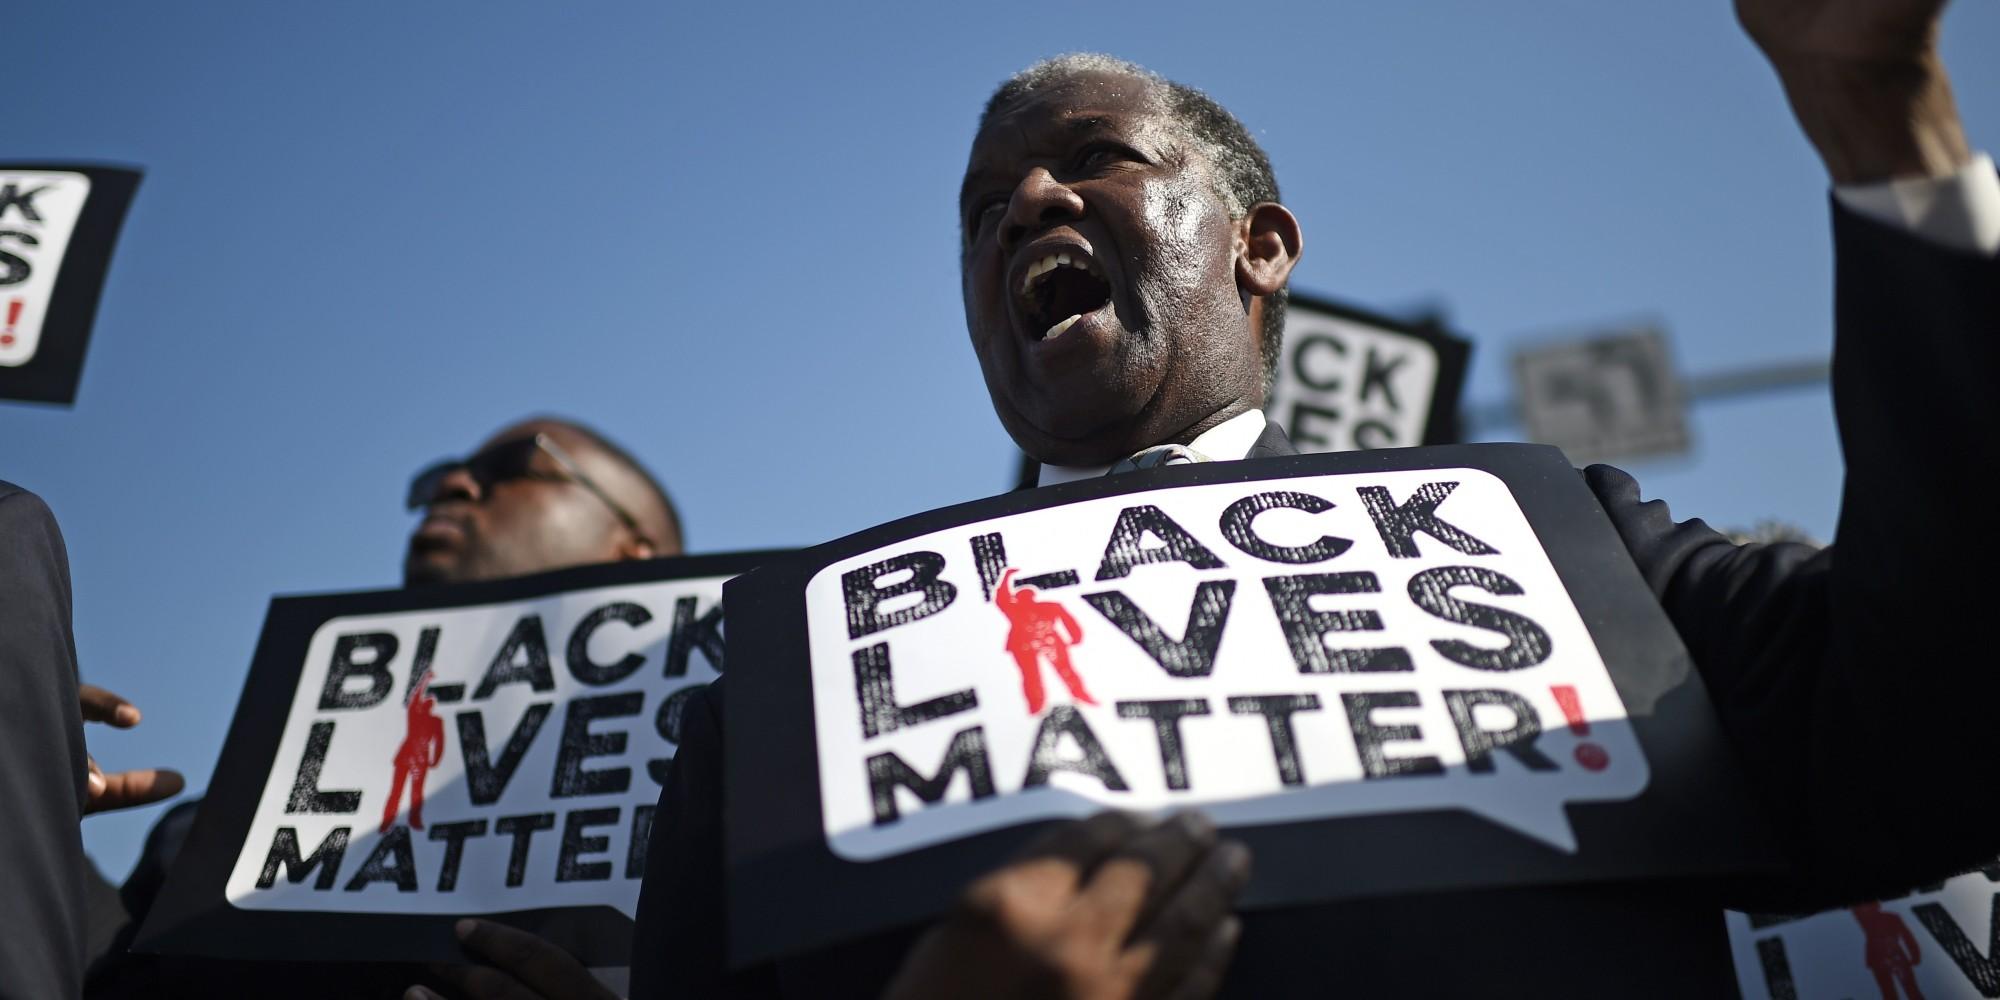 Beyond 'Black Lives Matter'